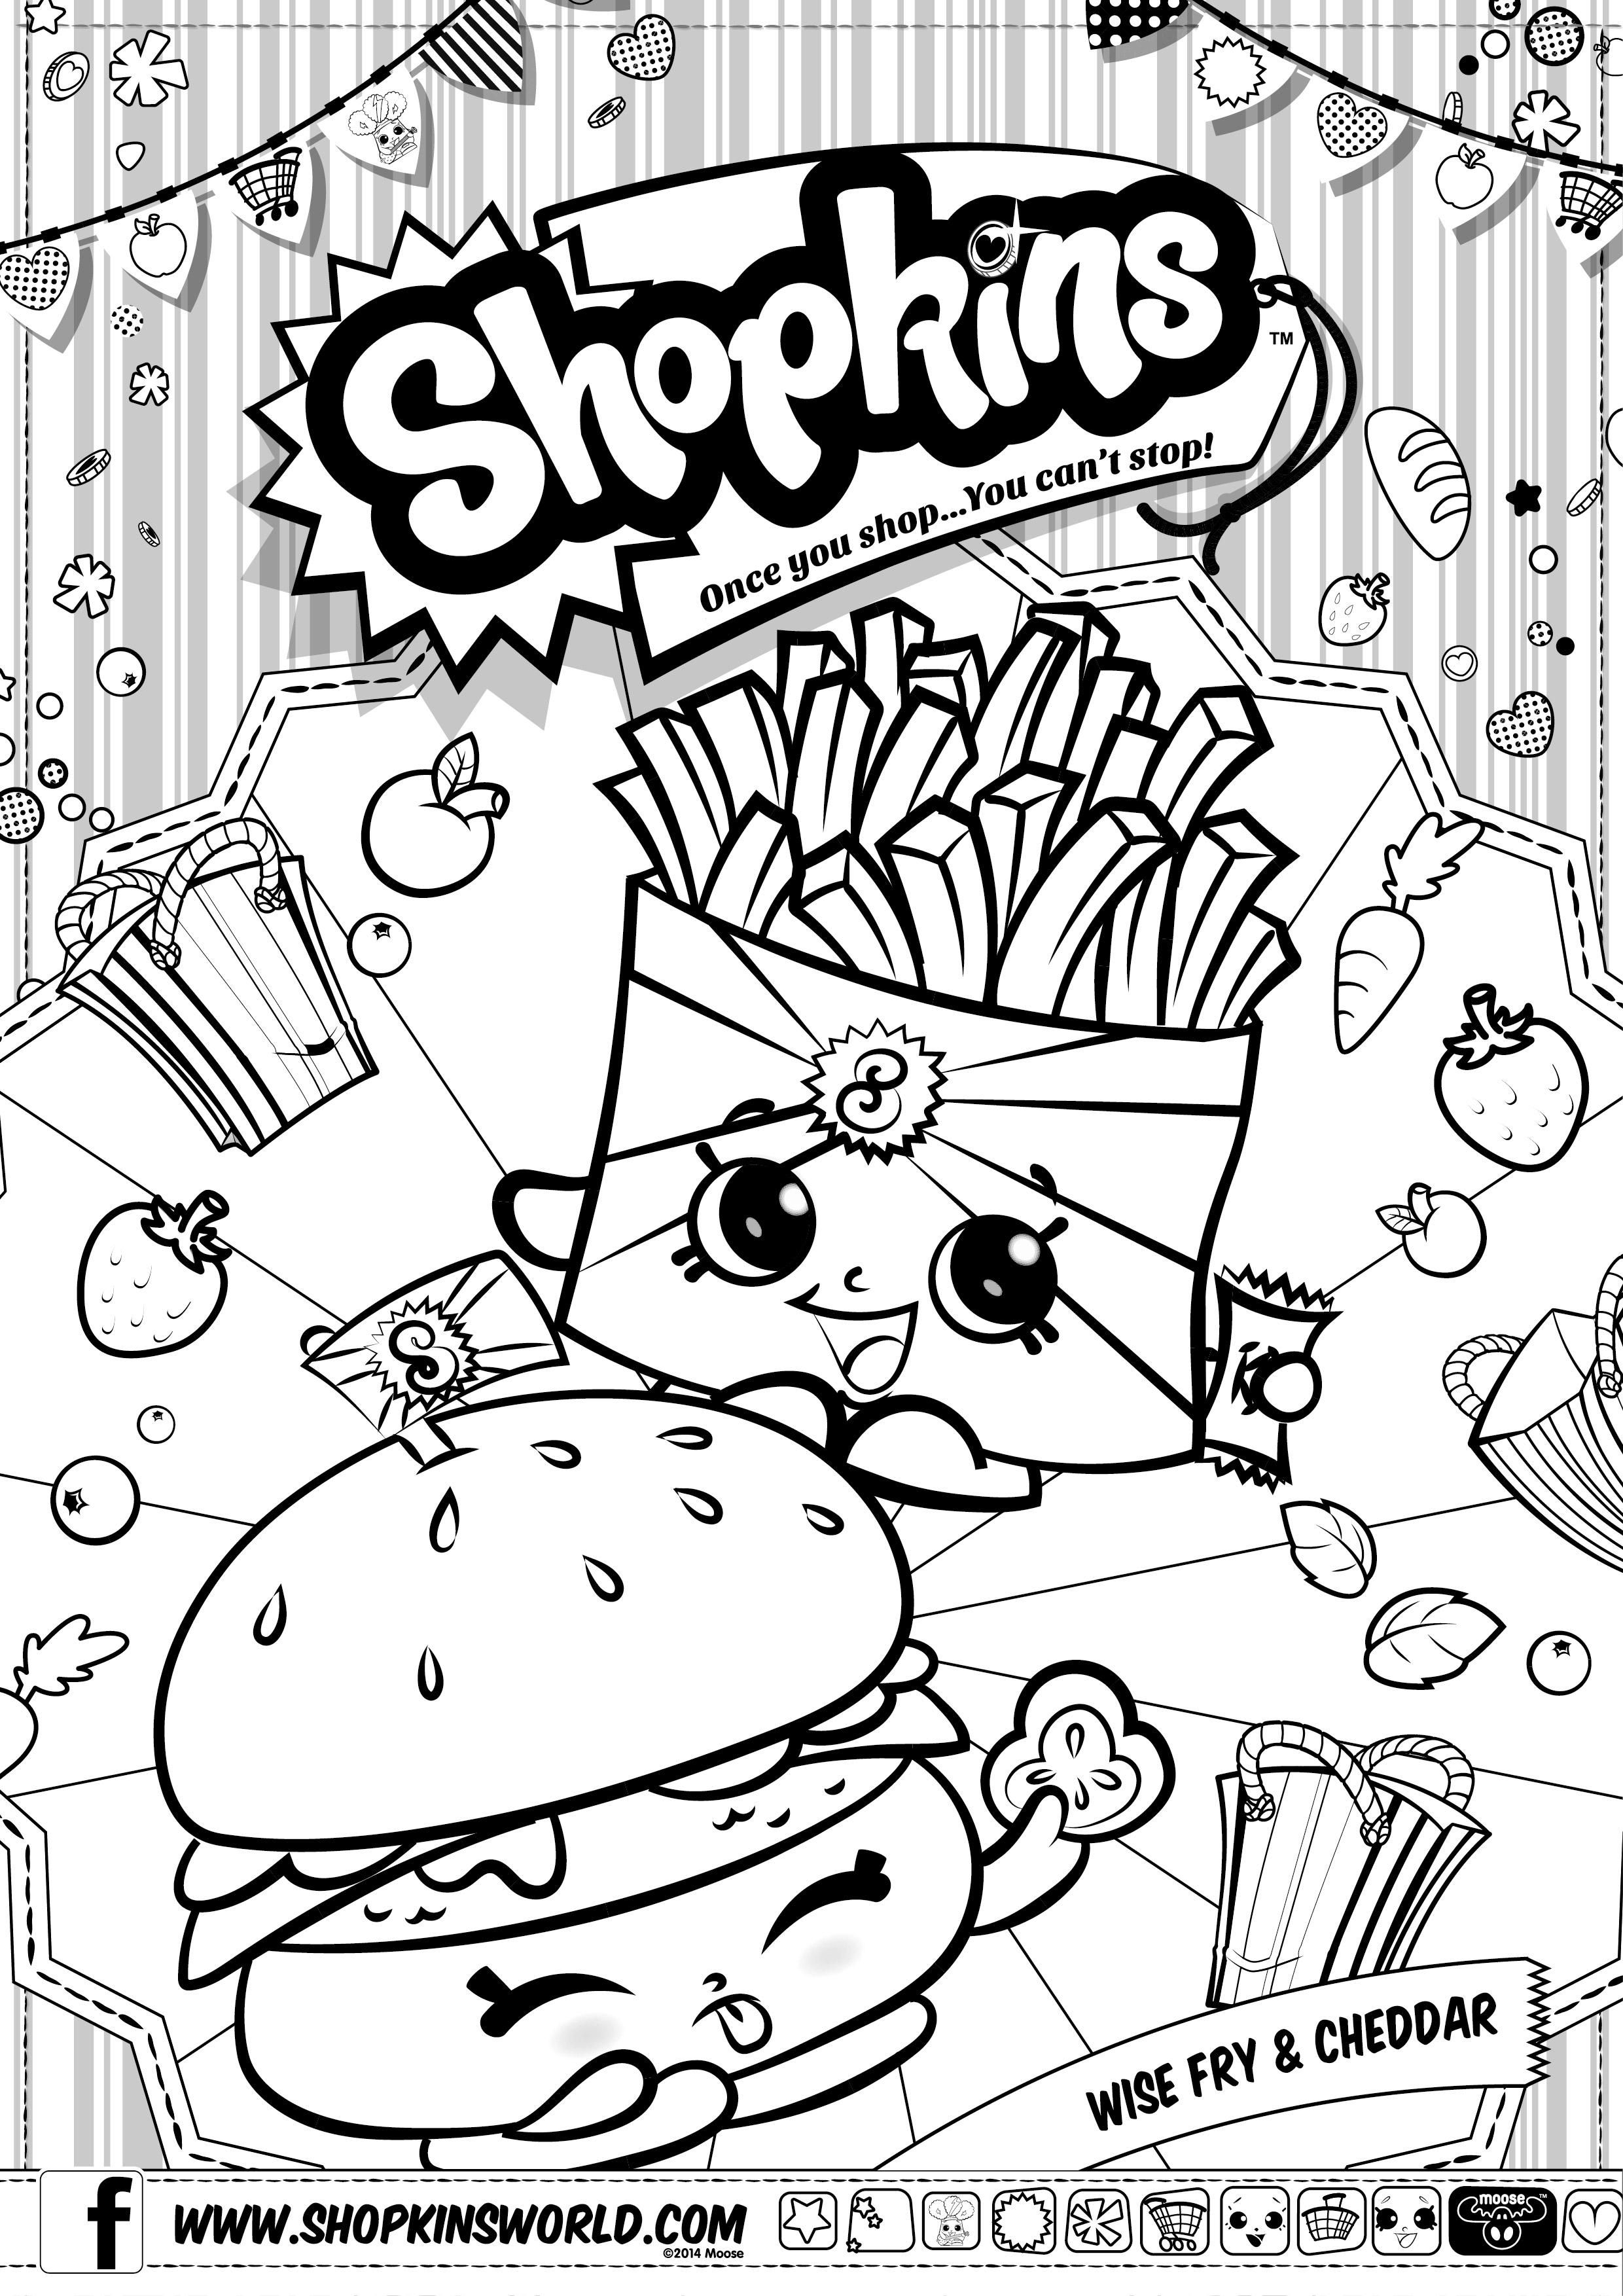 Shopkins logo clipart free image royalty free Shopkins clipart to print - ClipartFest image royalty free